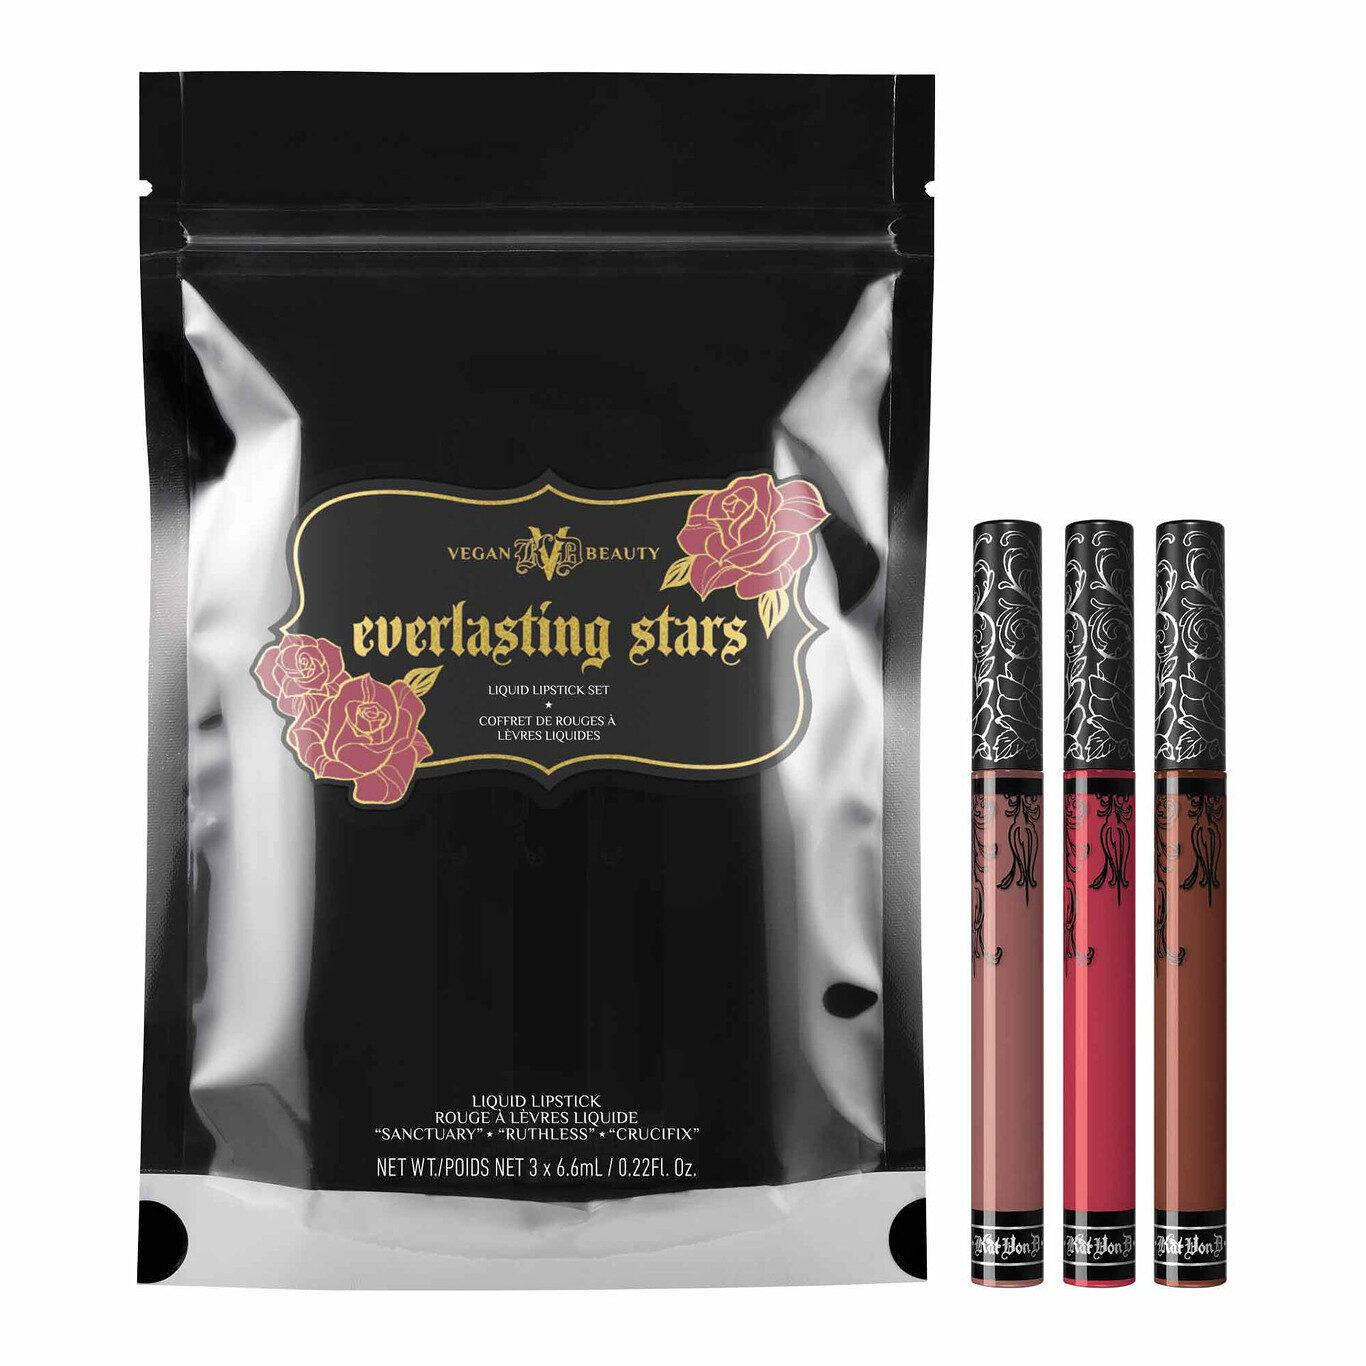 KVD Vegan Beauty Holiday Collection 2020 Everlasting Stars Liquid Lipstick Set